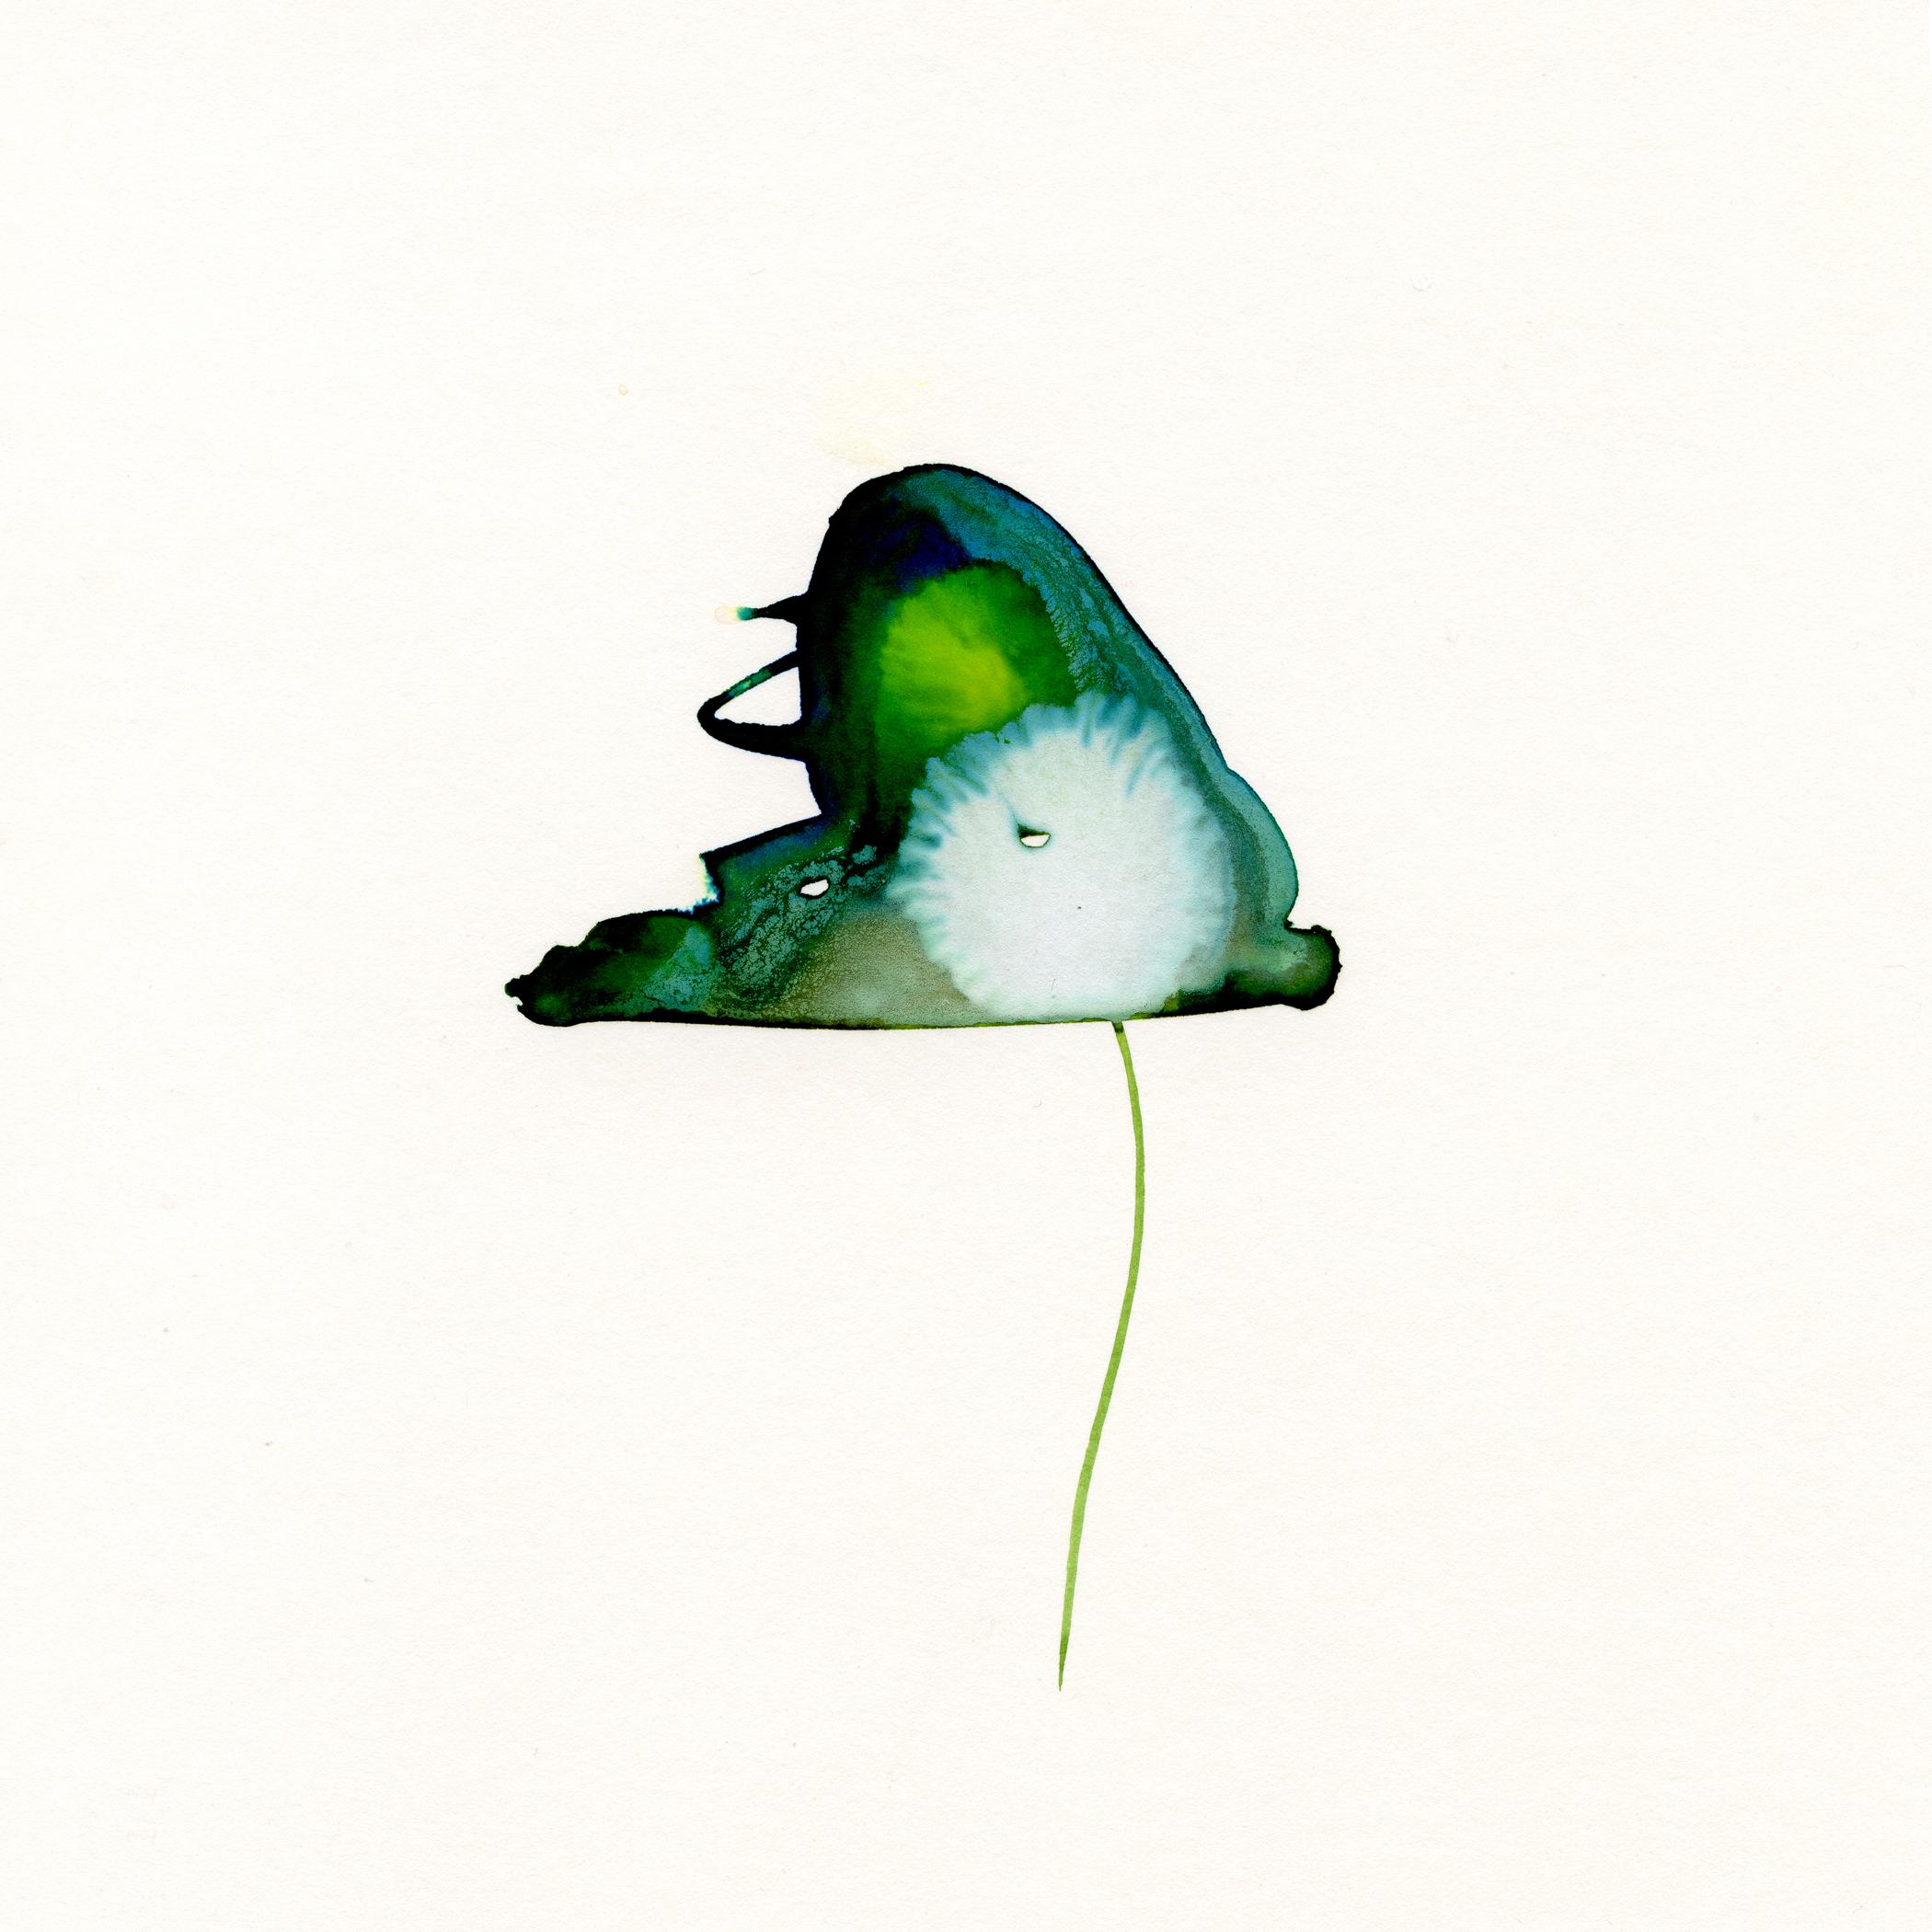 61.Lily.Pad.4.10.14.jpg